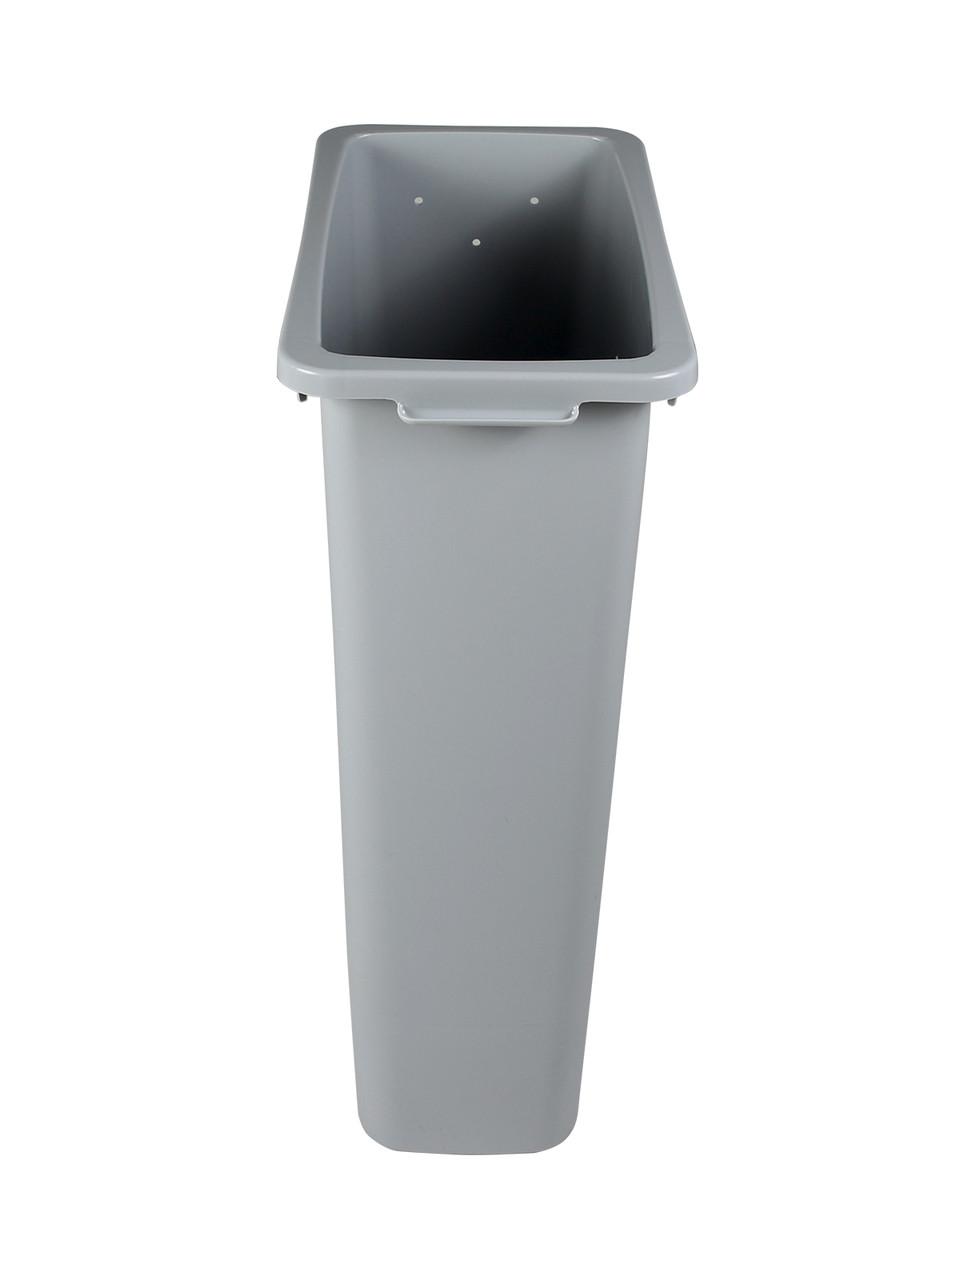 16 Gallon Skinny Plastic Home & Office Trash Can Gray